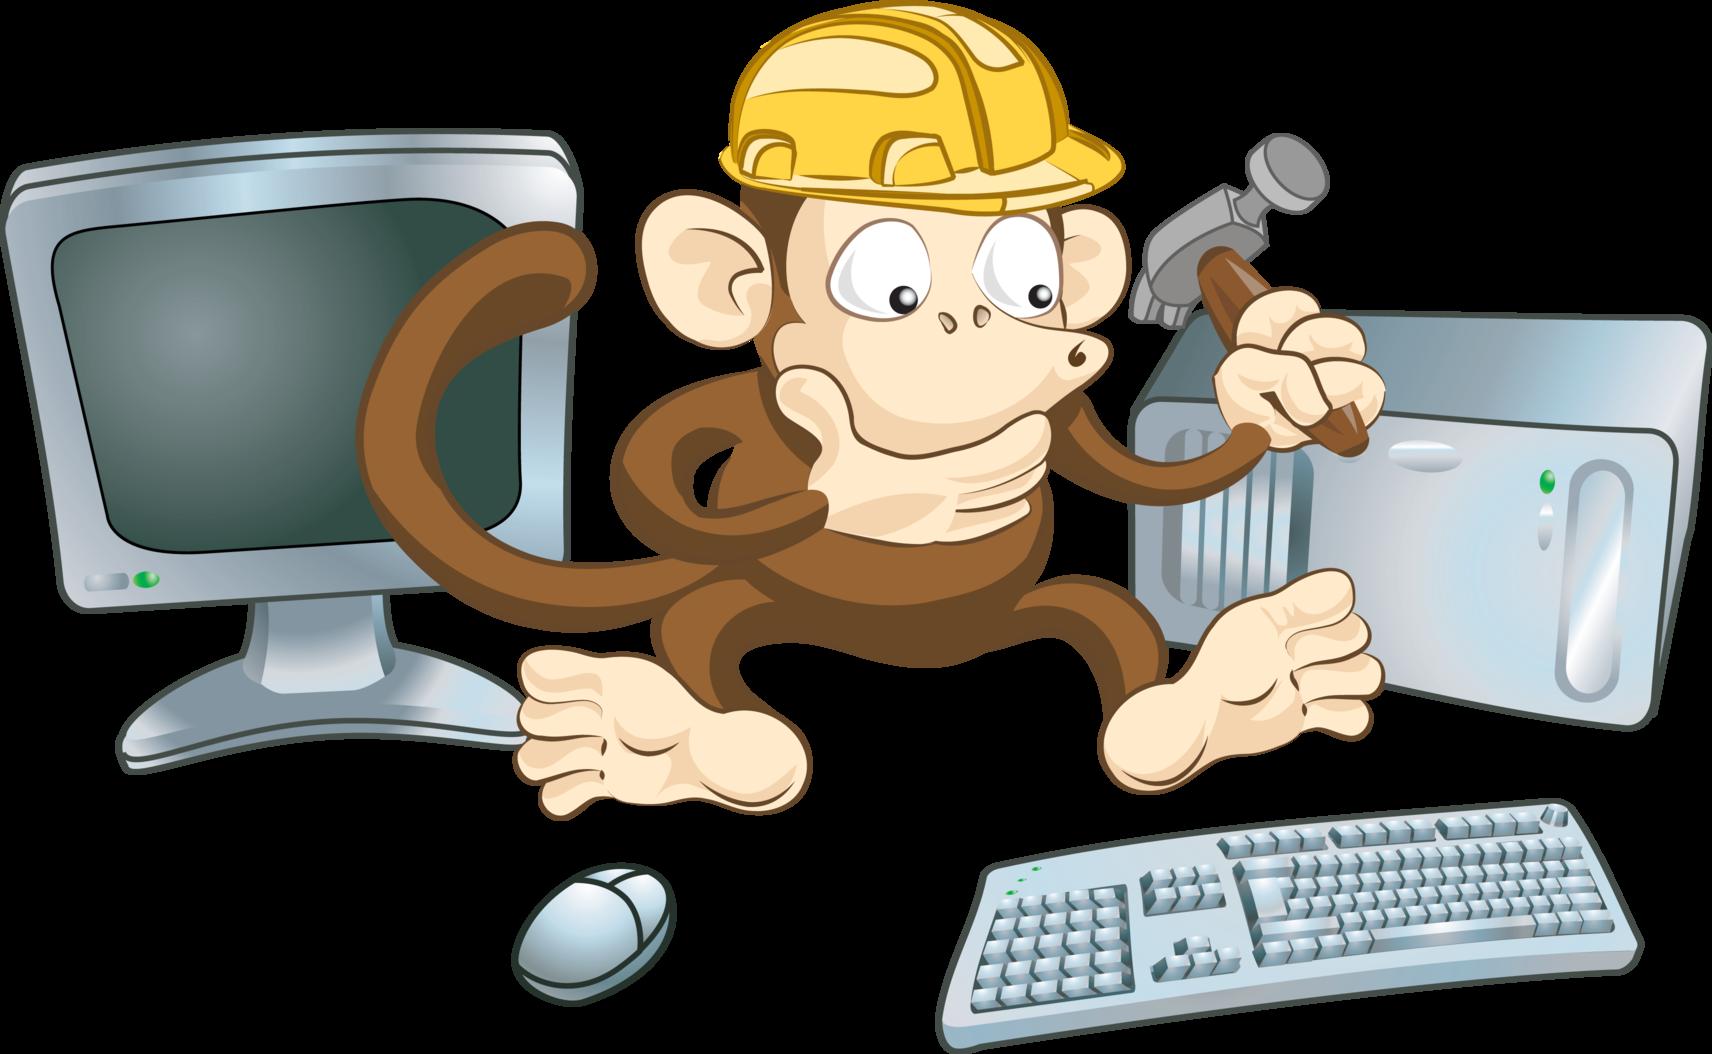 Free Repairman Cliparts, Download Free Clip Art, Free Clip ...Computer Repair Clip Art Black And White